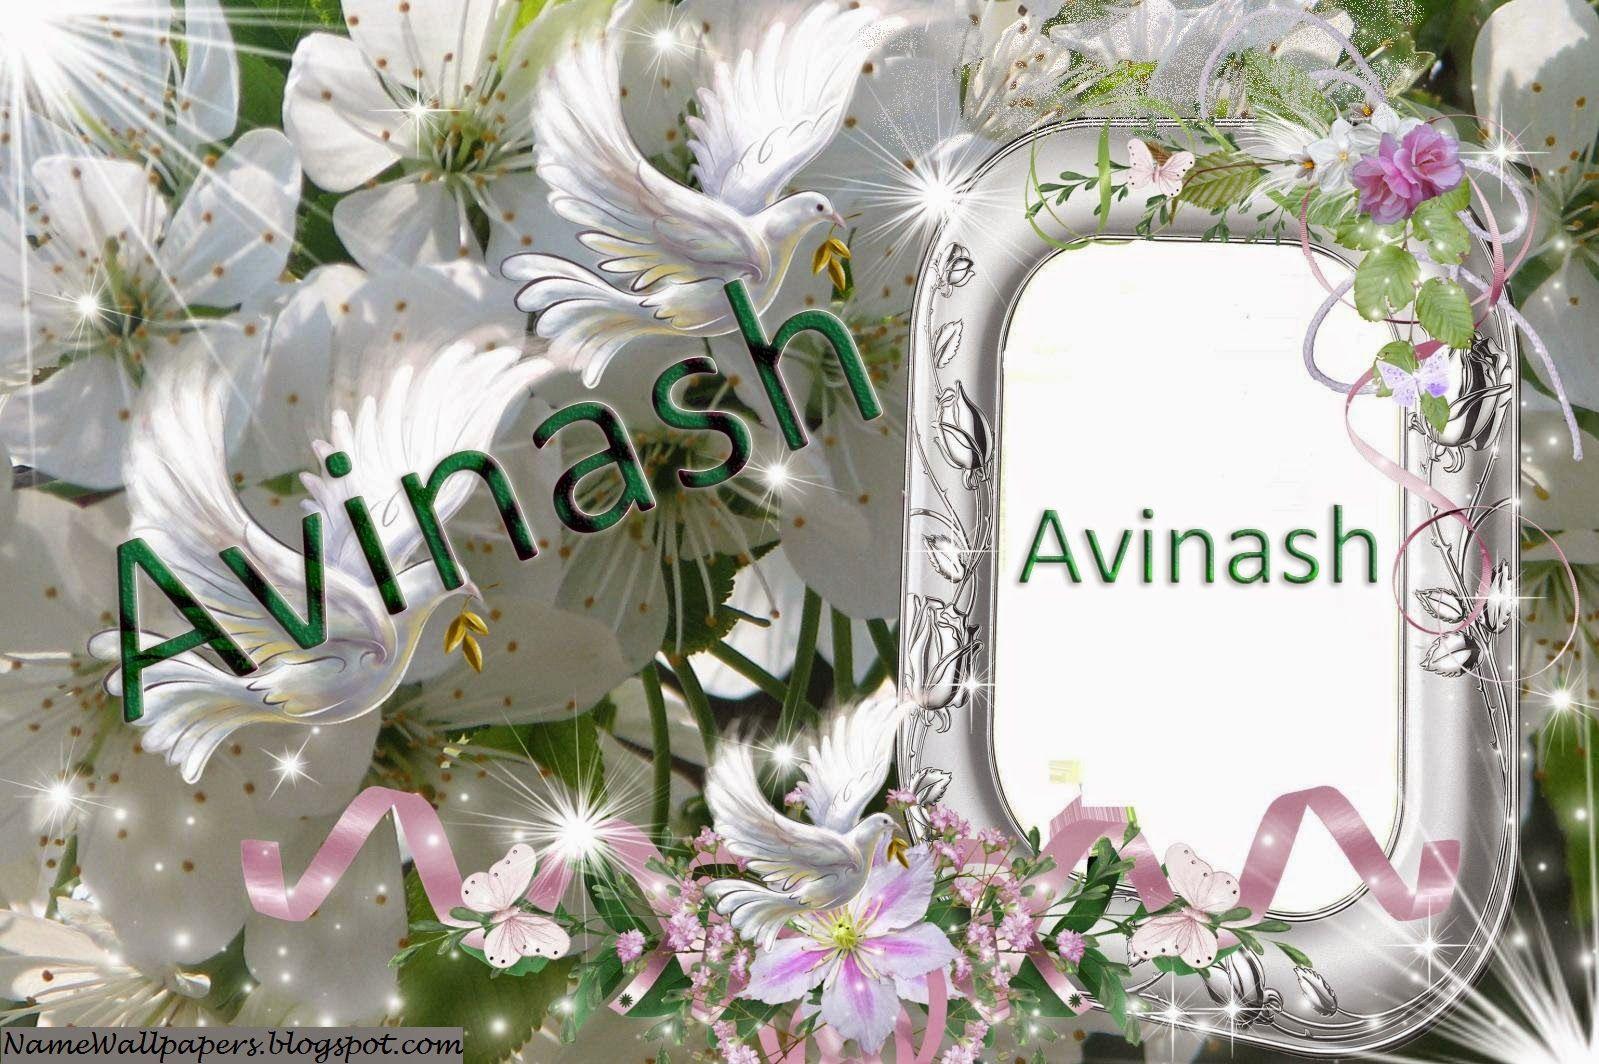 Cool Wallpaper Name Avinash - b999dce6c82142cc70fcf00dea287c64  You Should Have_94241.jpg